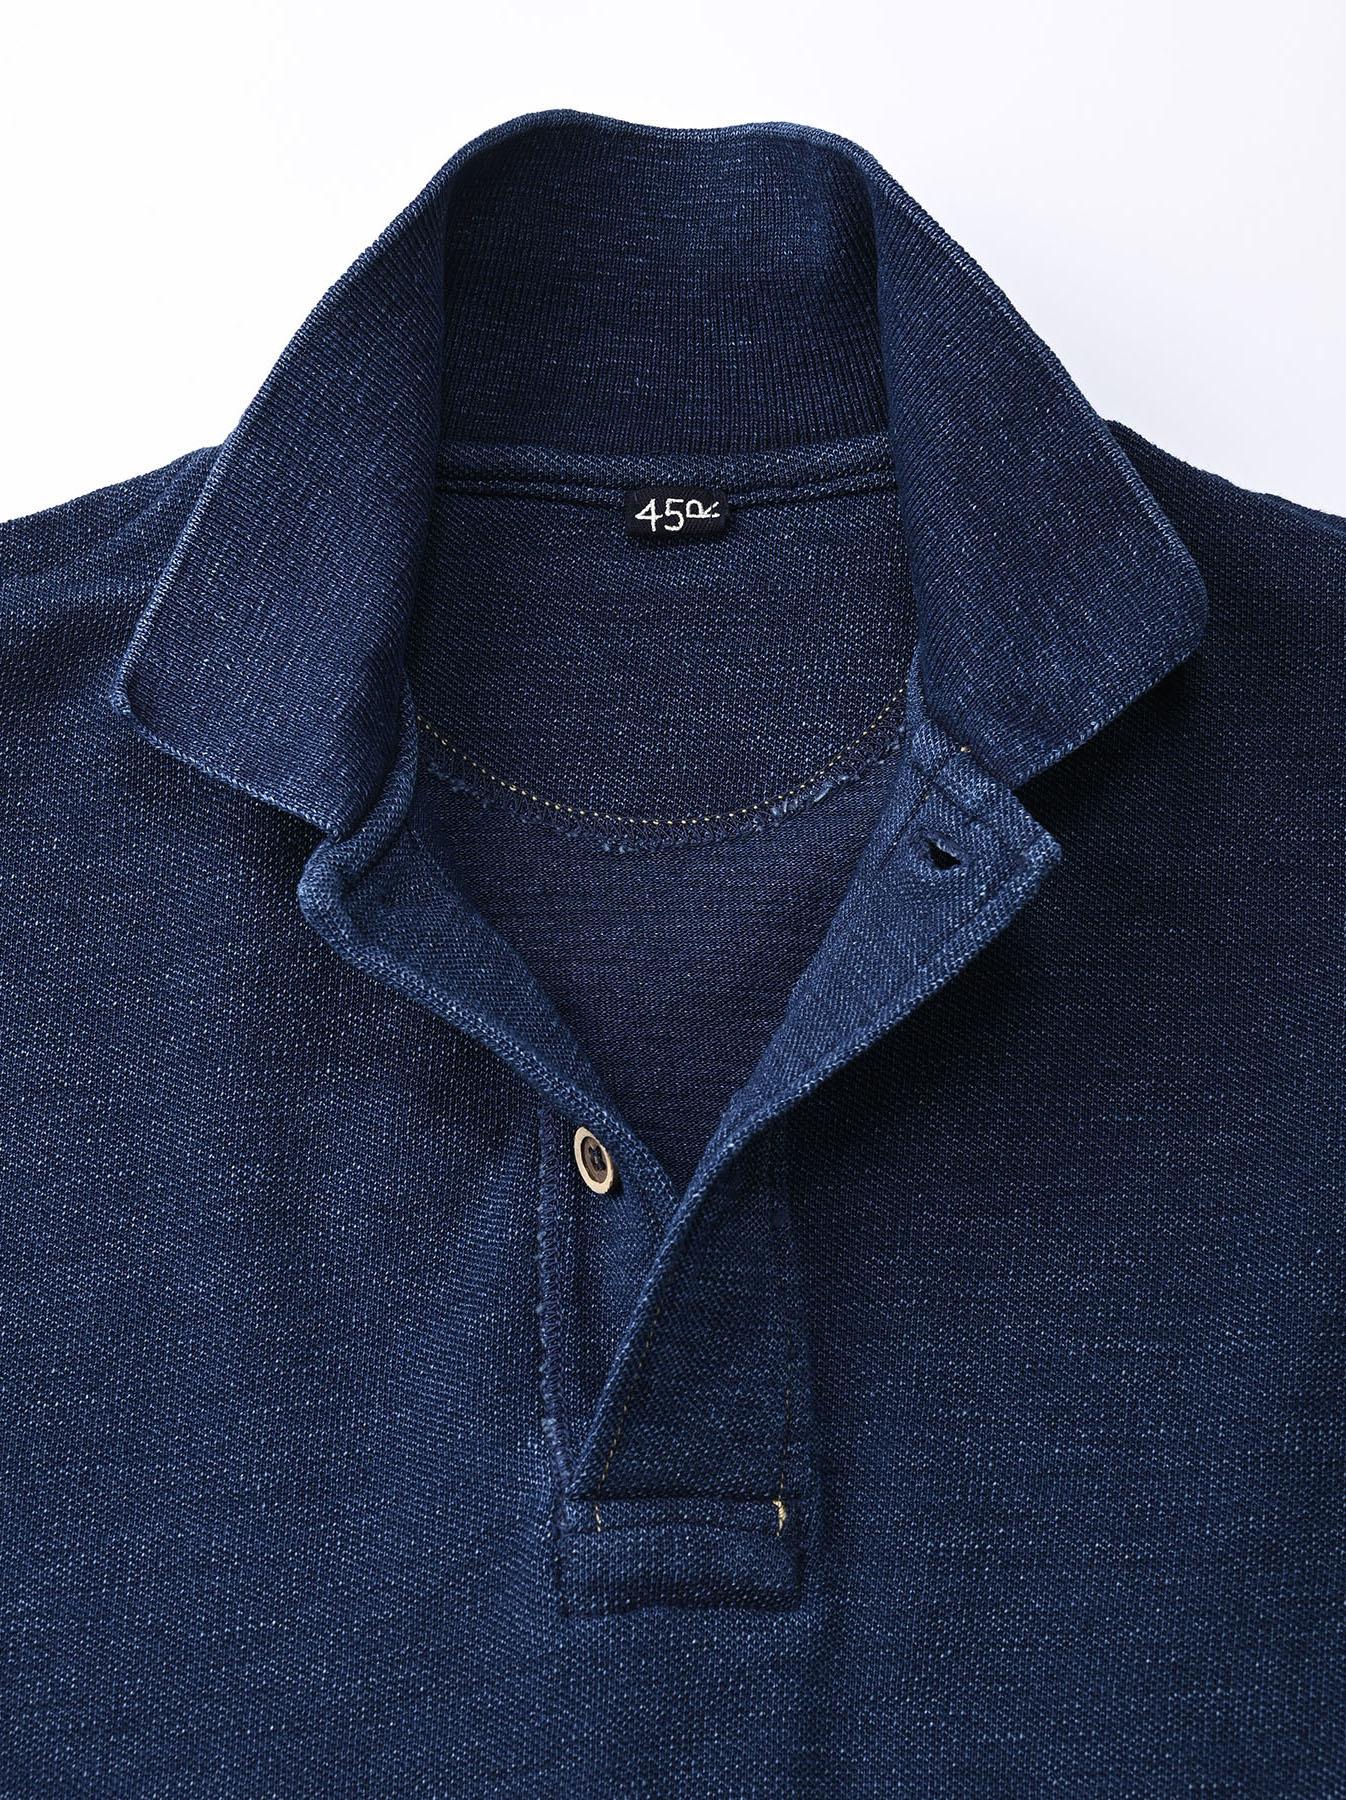 Indigo Kanoko Shiokaze Long-sleeved Square Polo Shirt (0521)-7